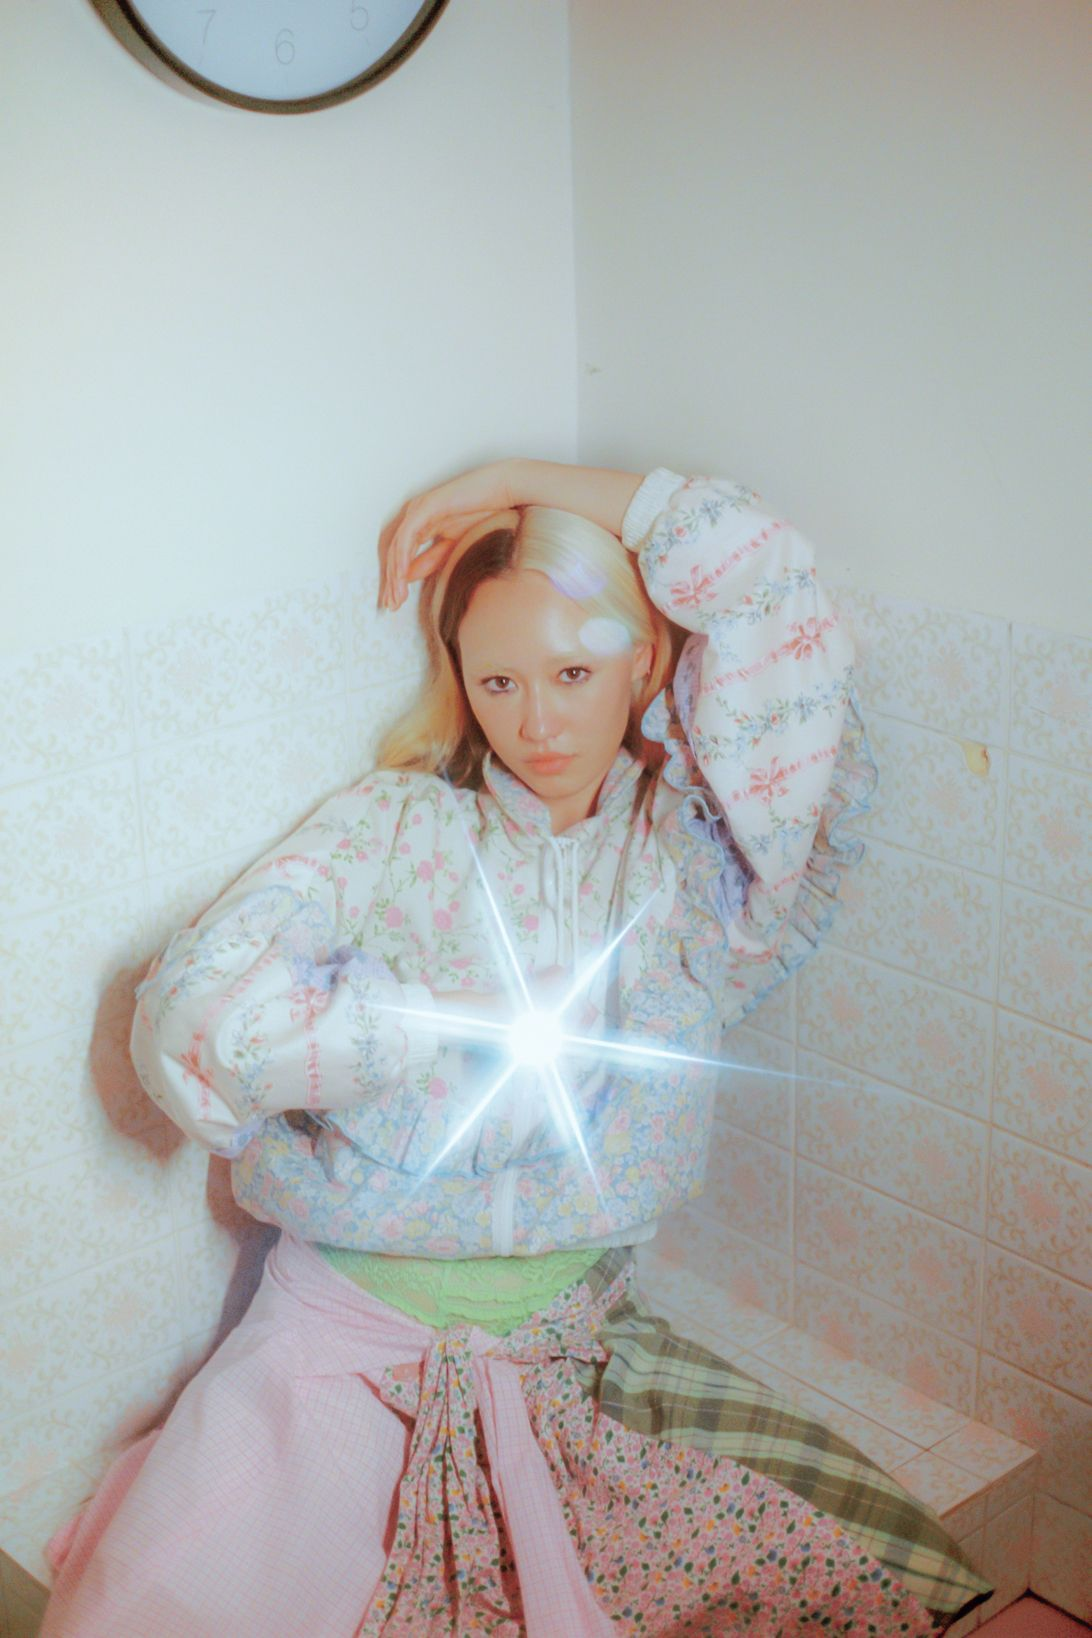 Phoebe Pendergast-Jones